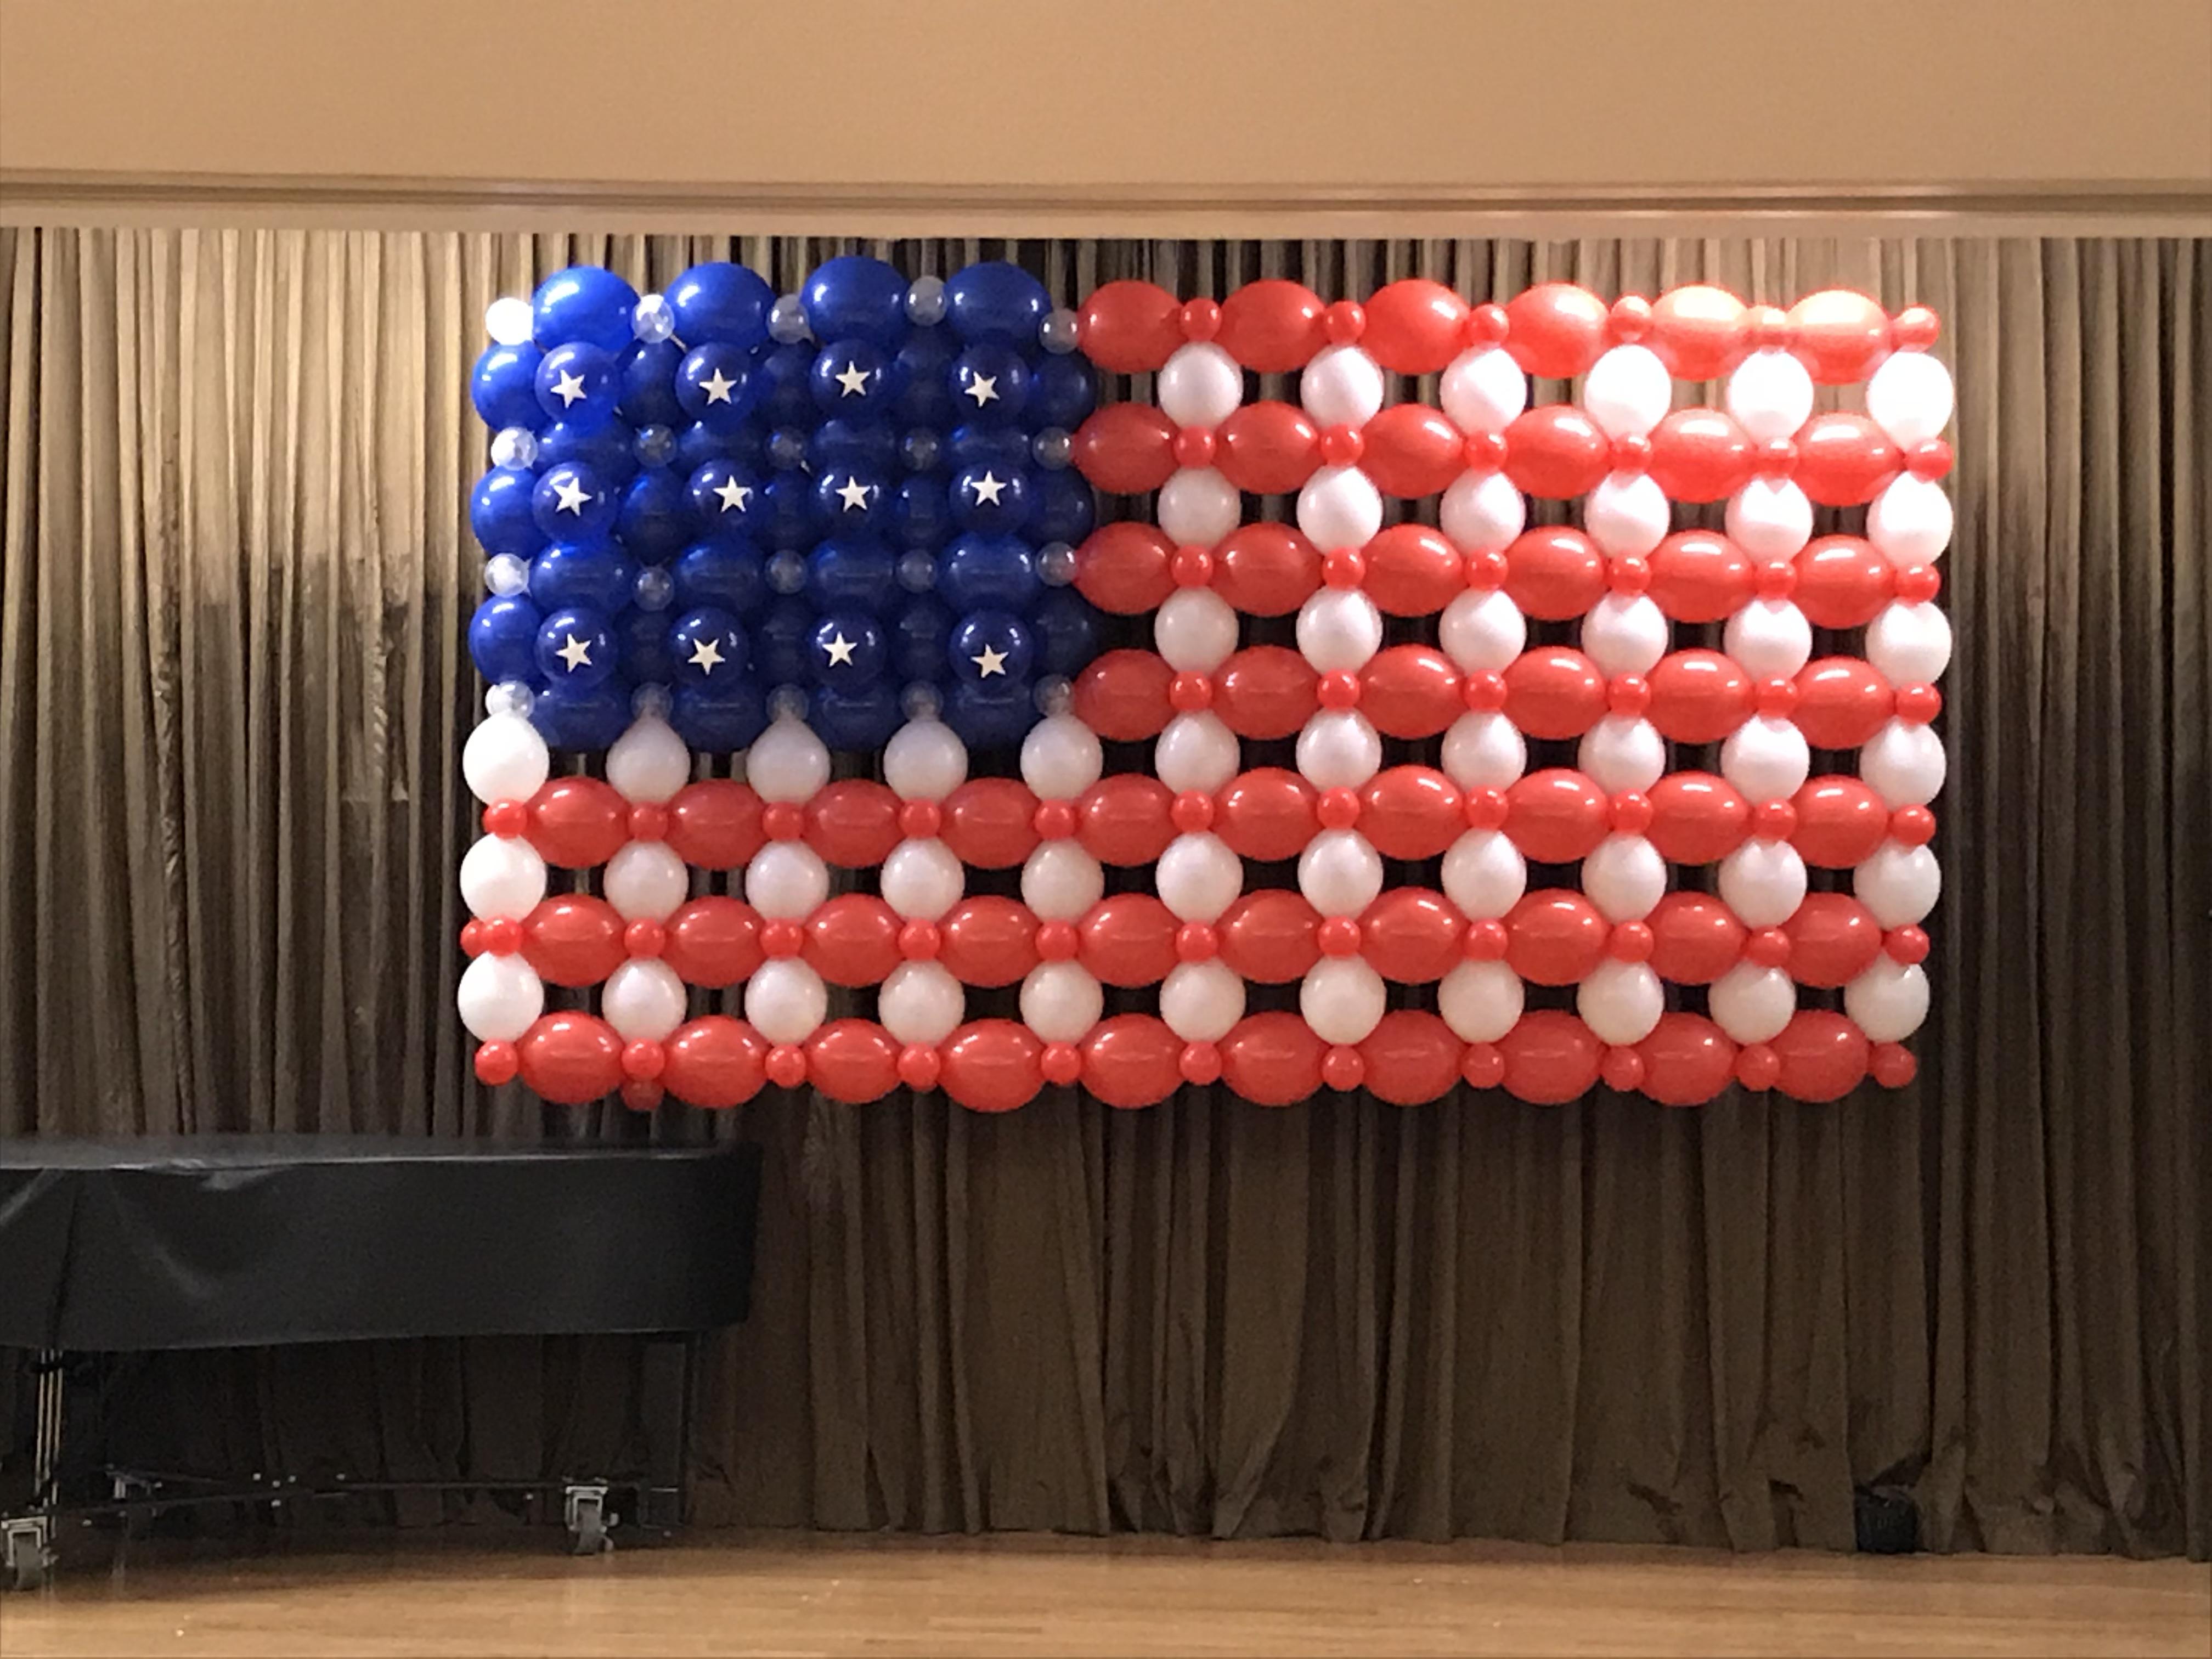 12' X 7' U.S.A. Flag